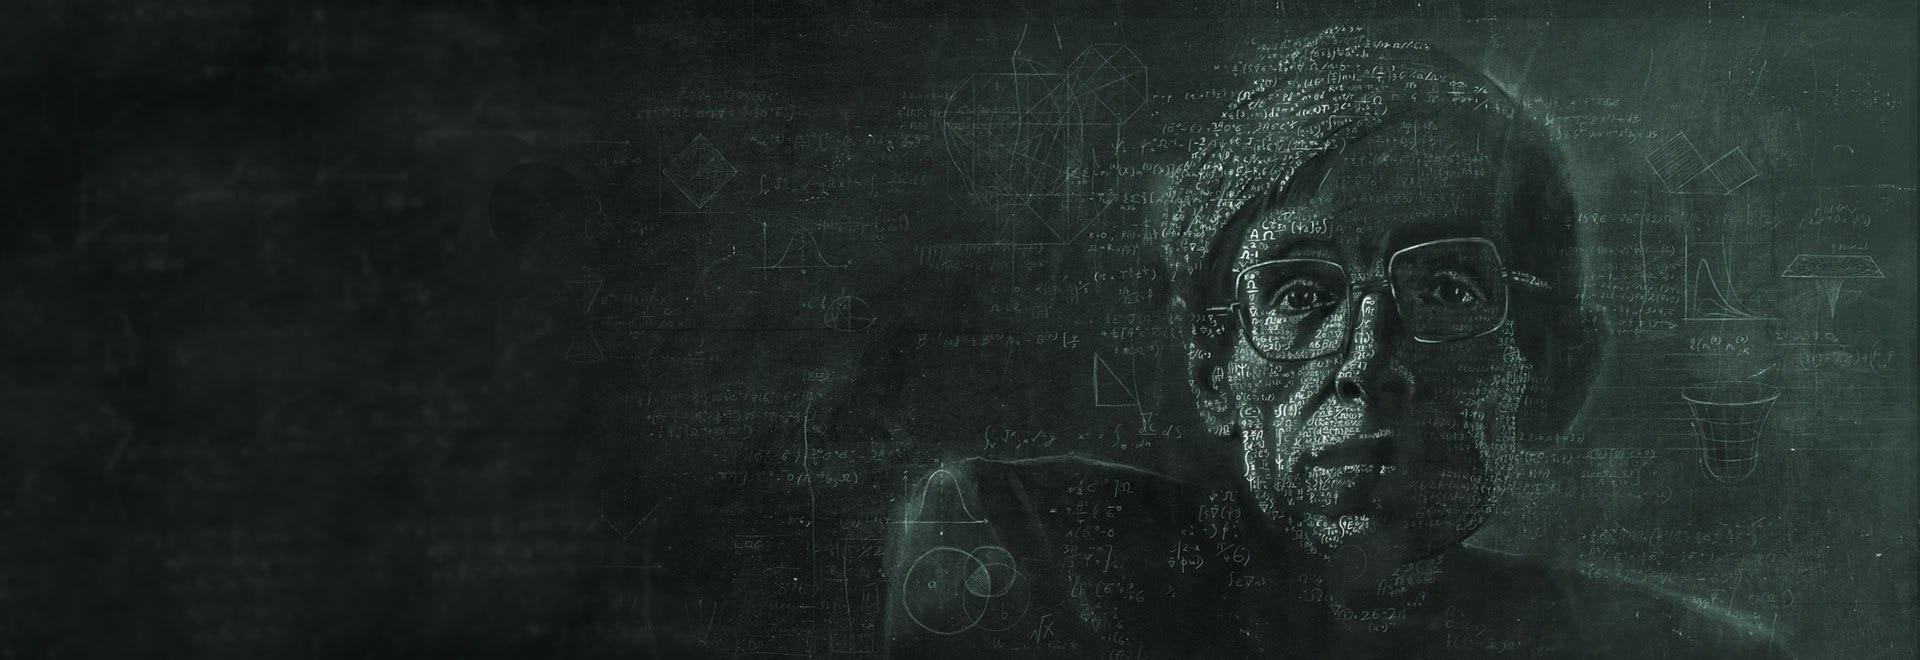 Stephen Hawking - Riuscite a sentirmi?